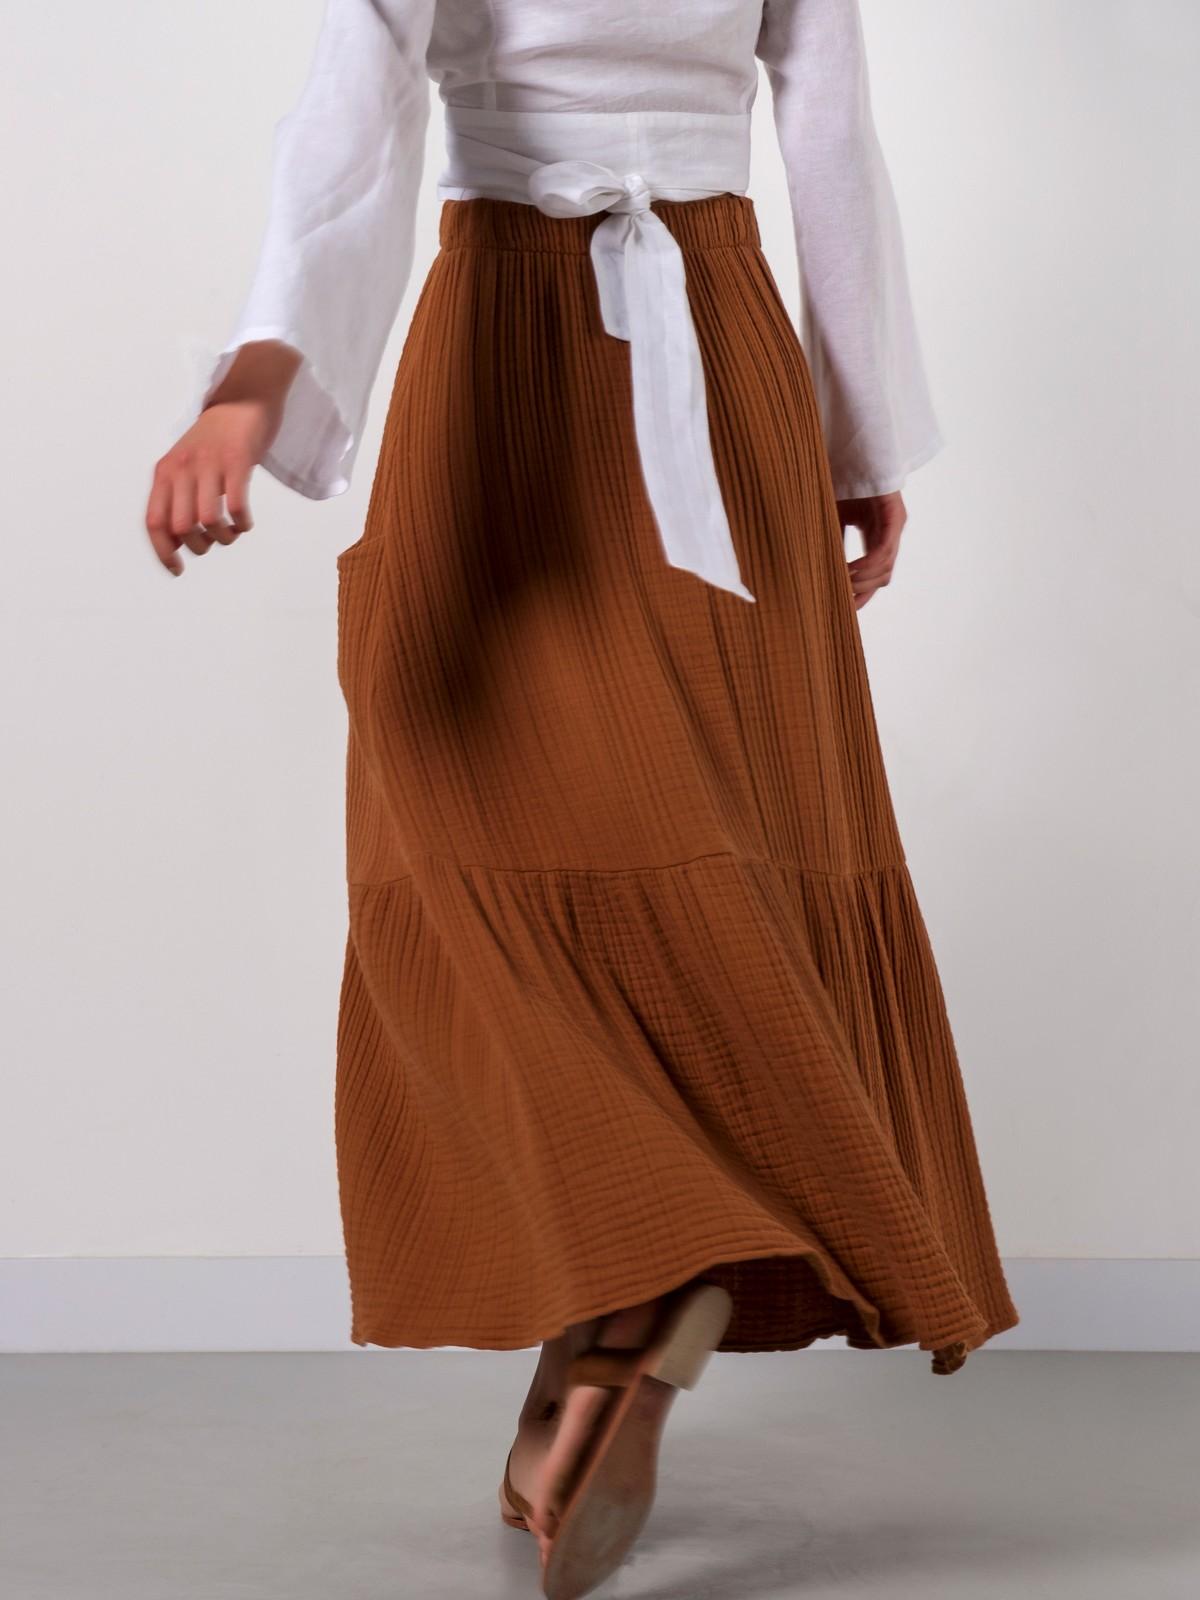 alba-skirt-brown3-1200x1600w